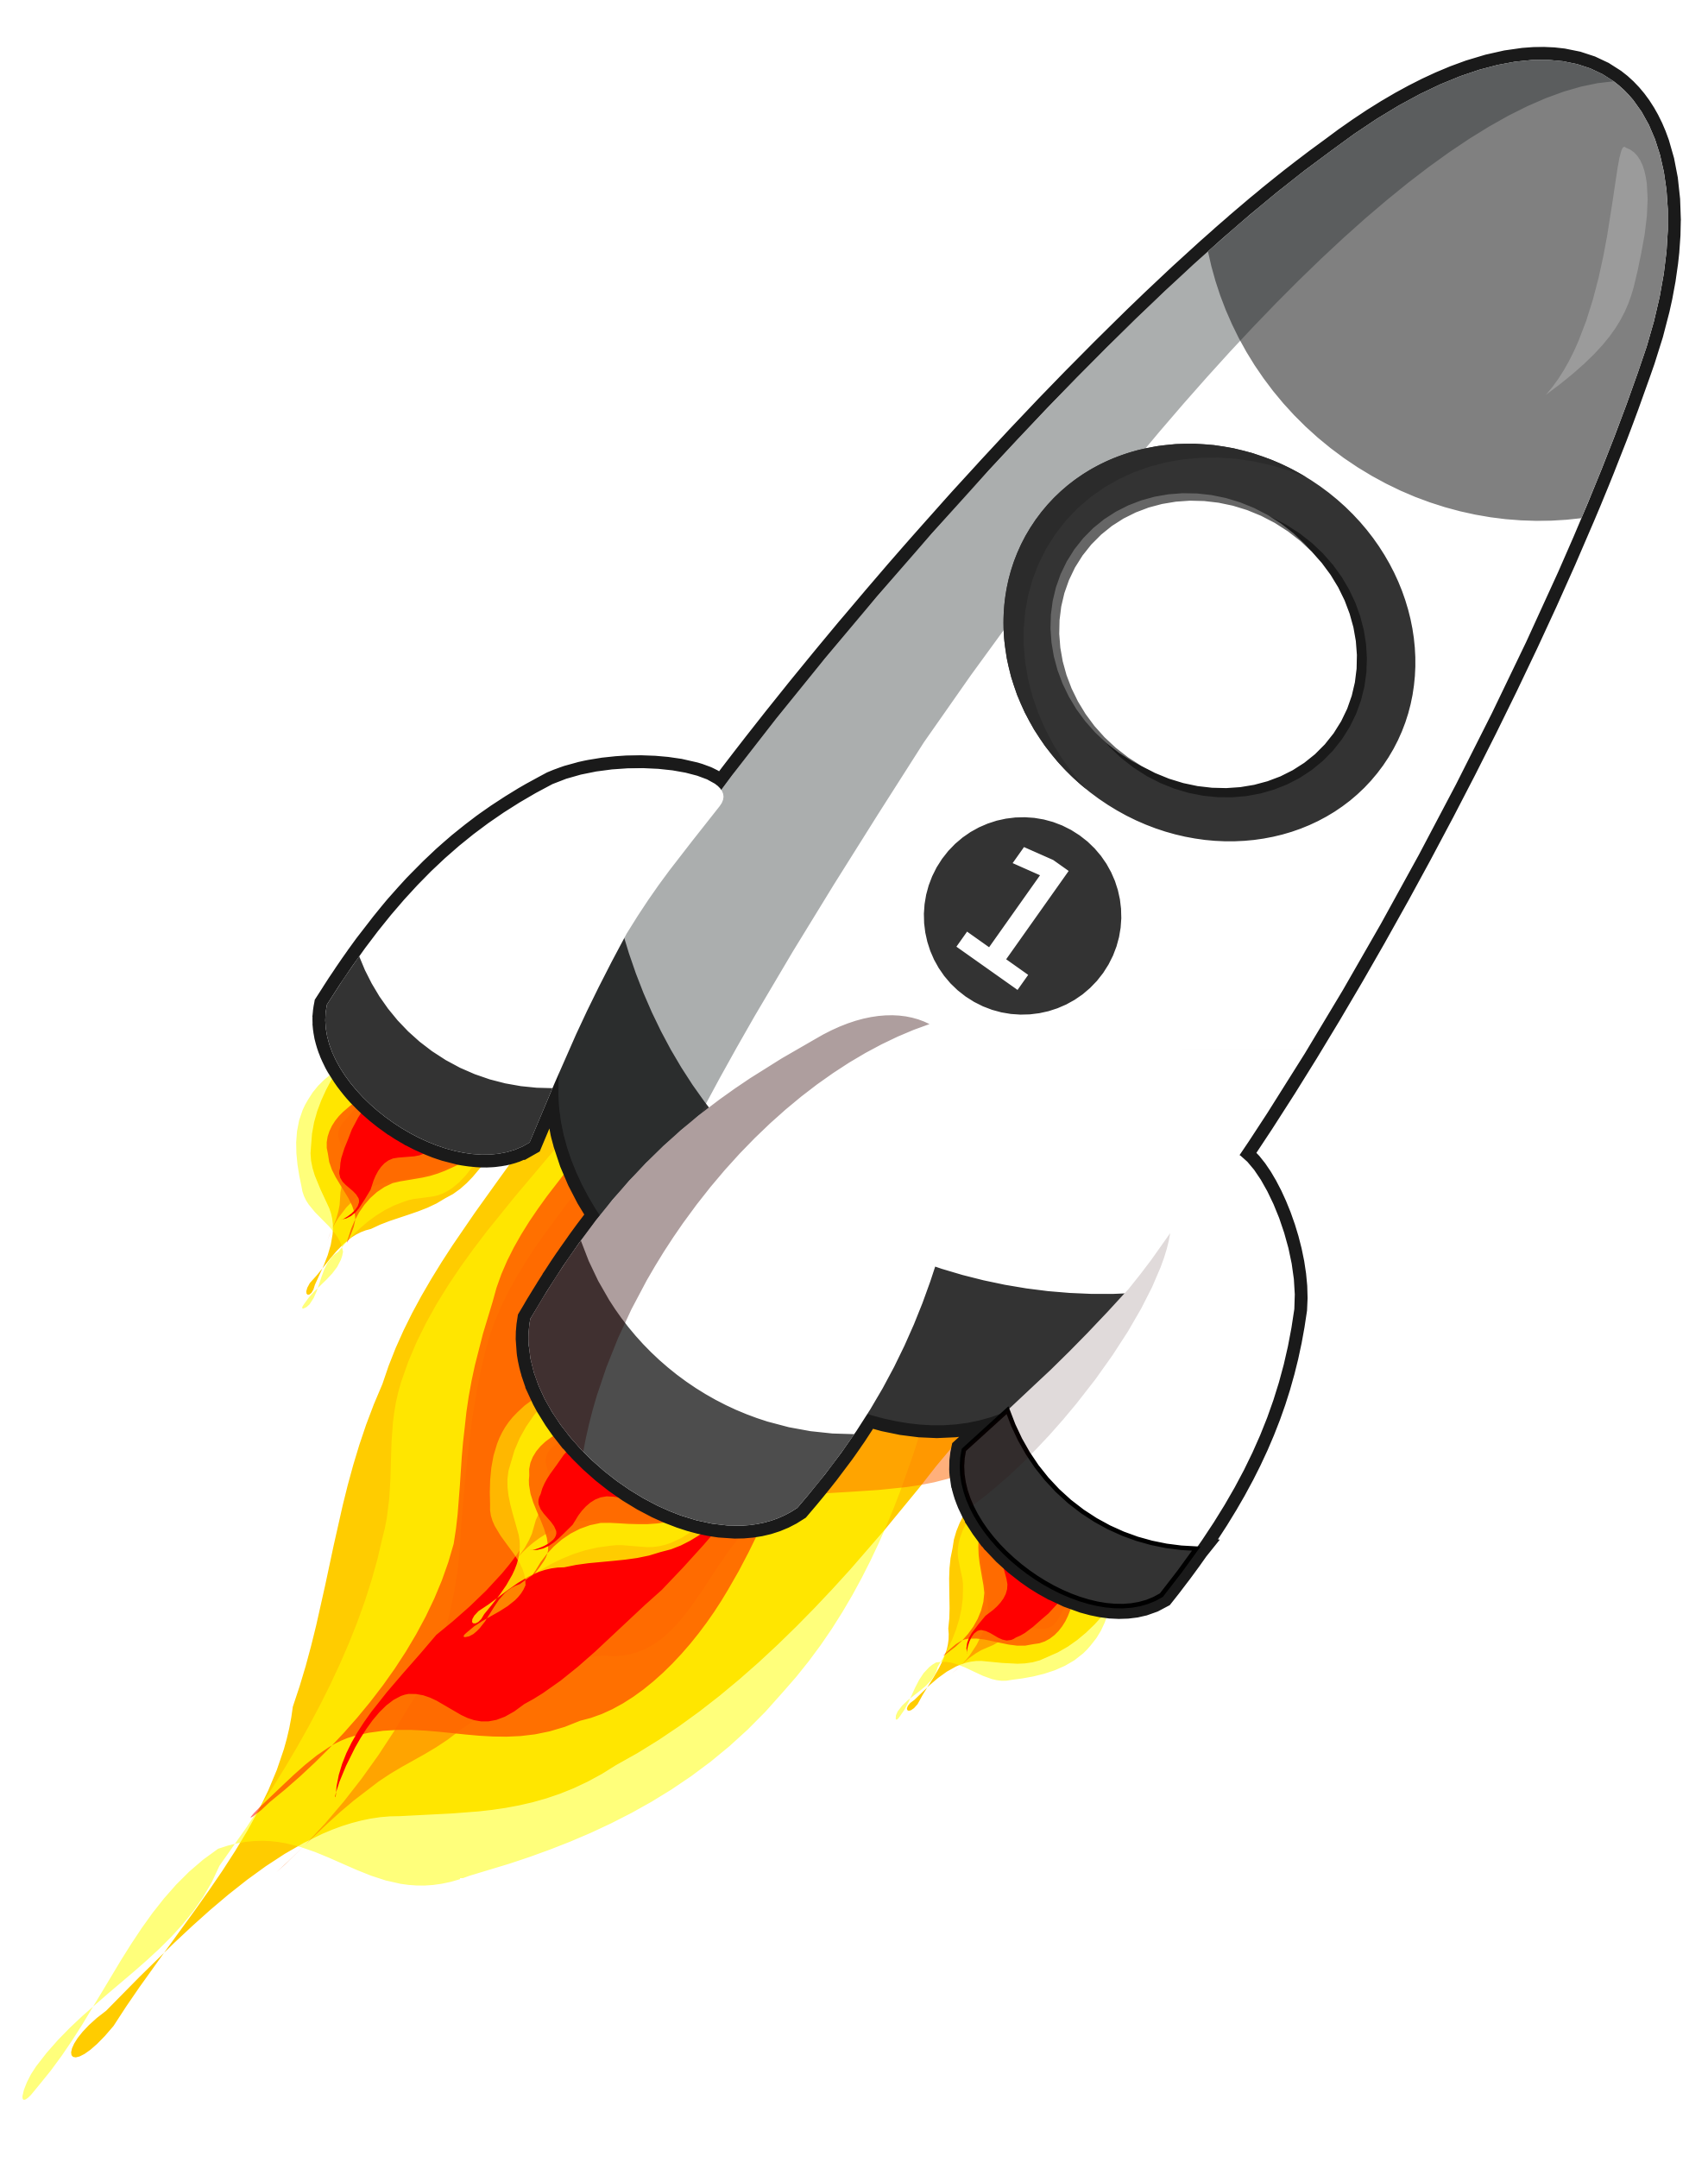 Download - Rocket Ship PNG HD